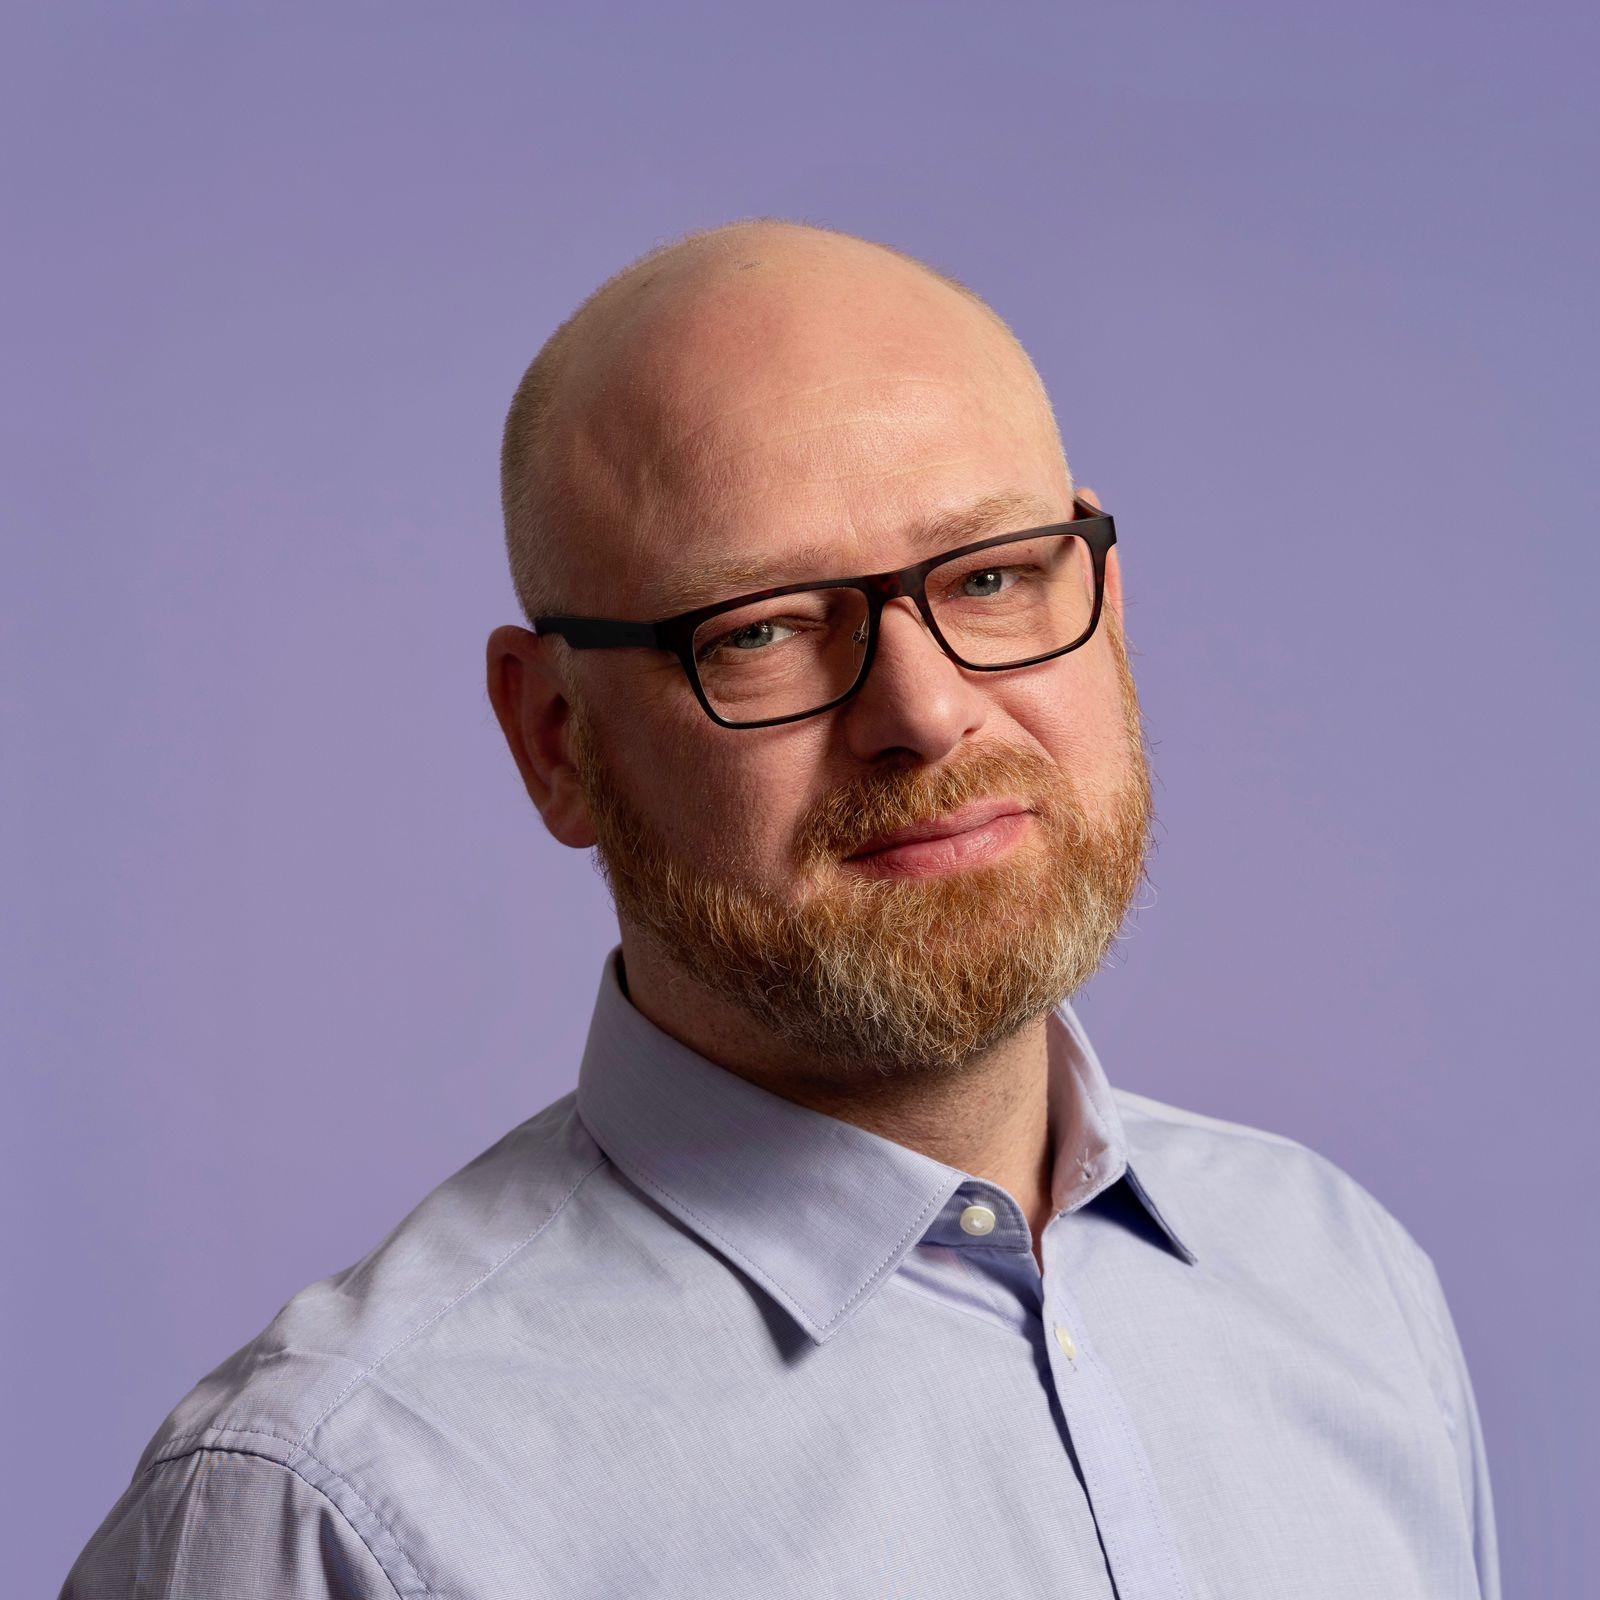 Sören Wittig